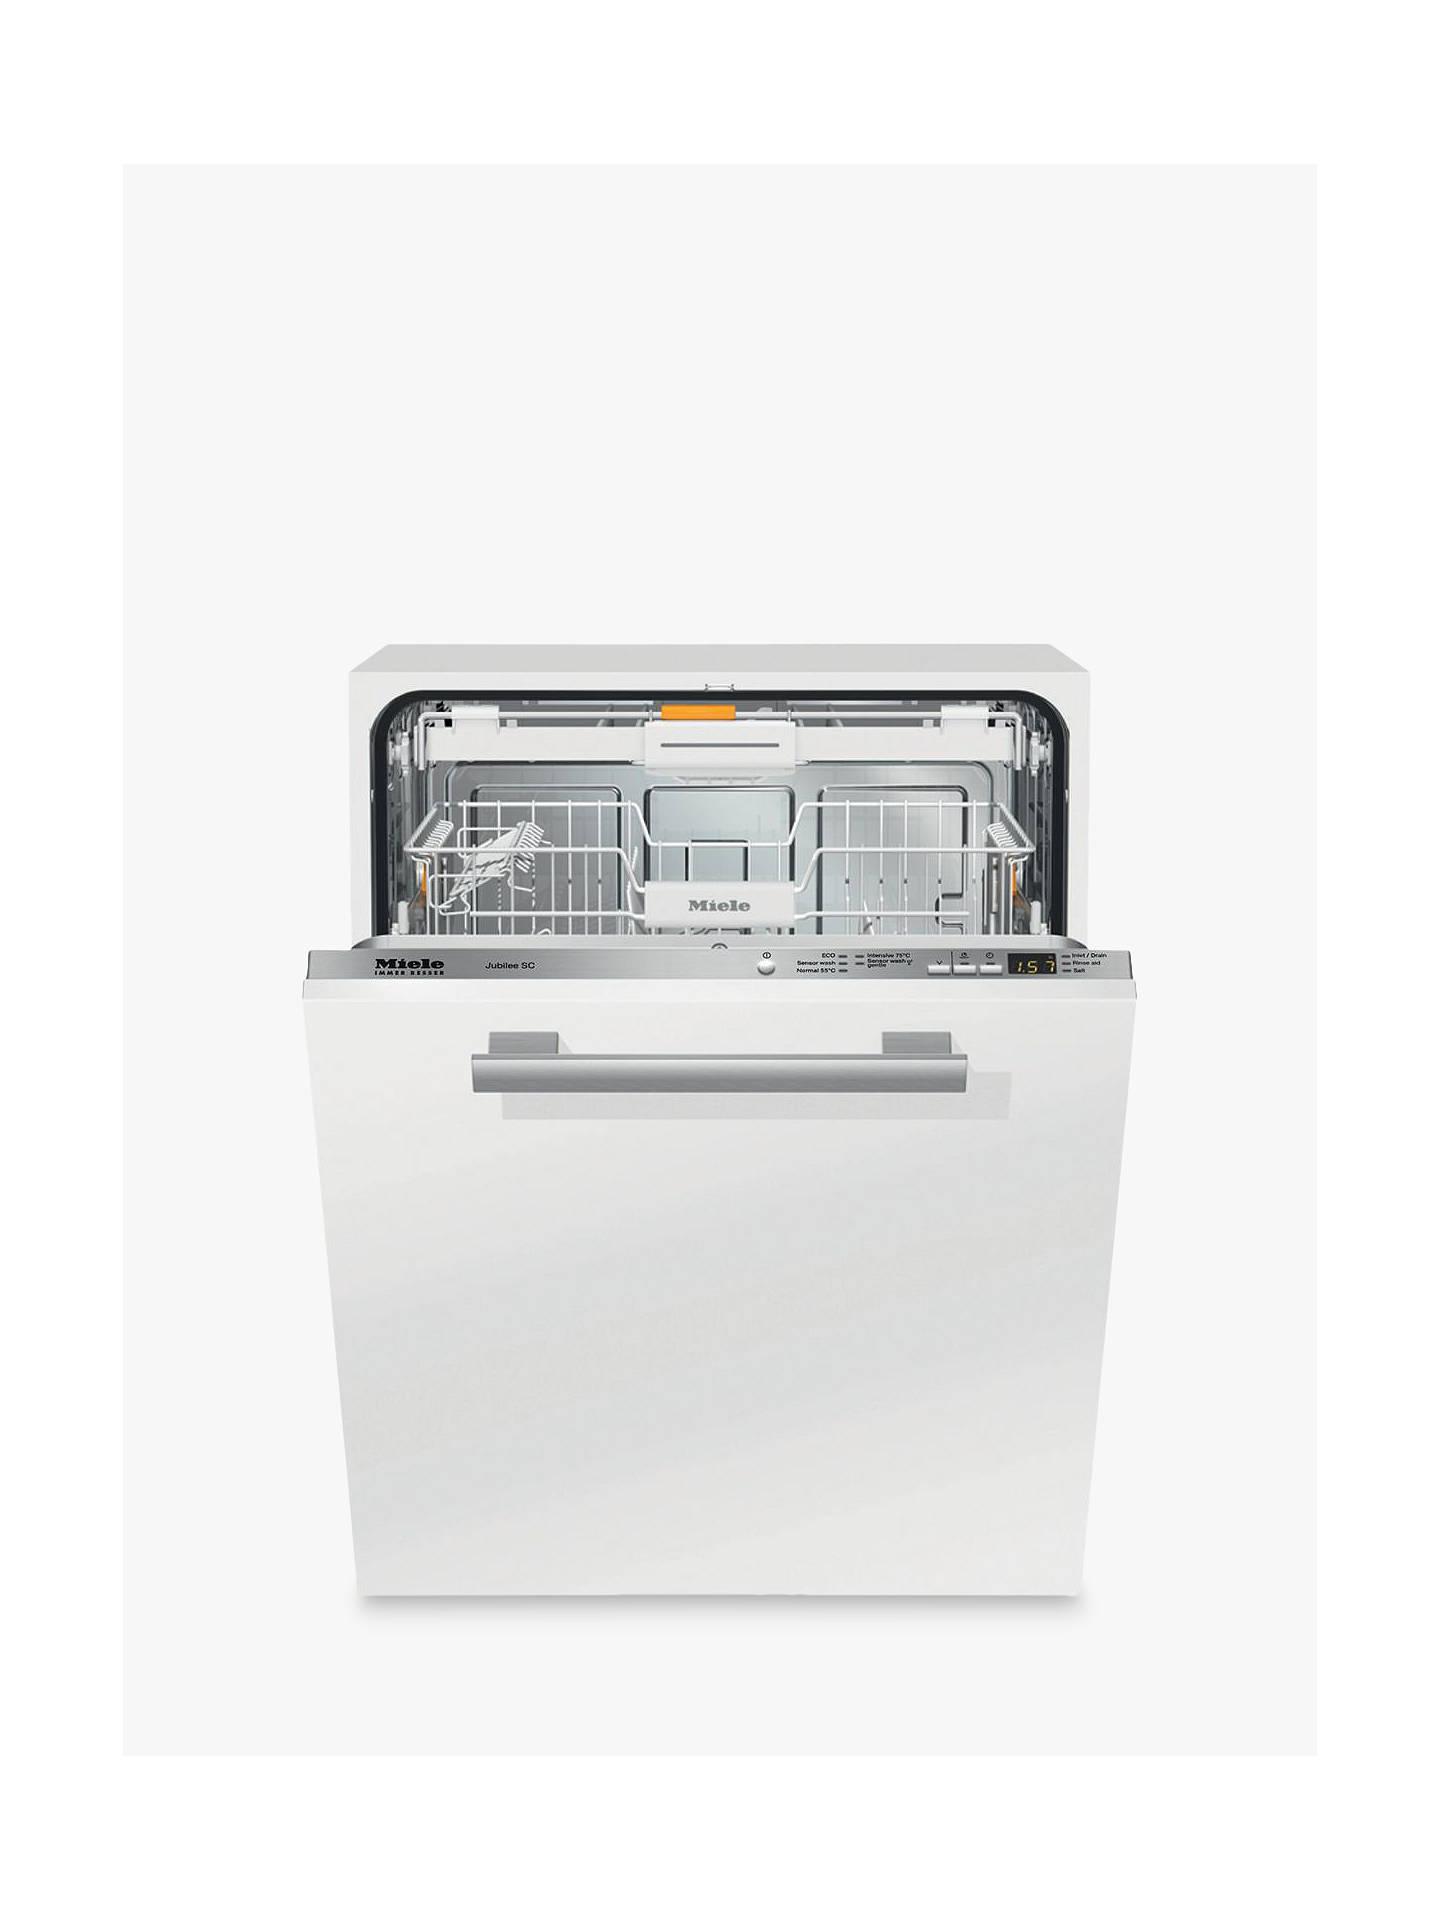 Miele G4990scvi Integrated Dishwasher At John Lewis Partners Washing Machine Wiring Diagram Buymiele Online